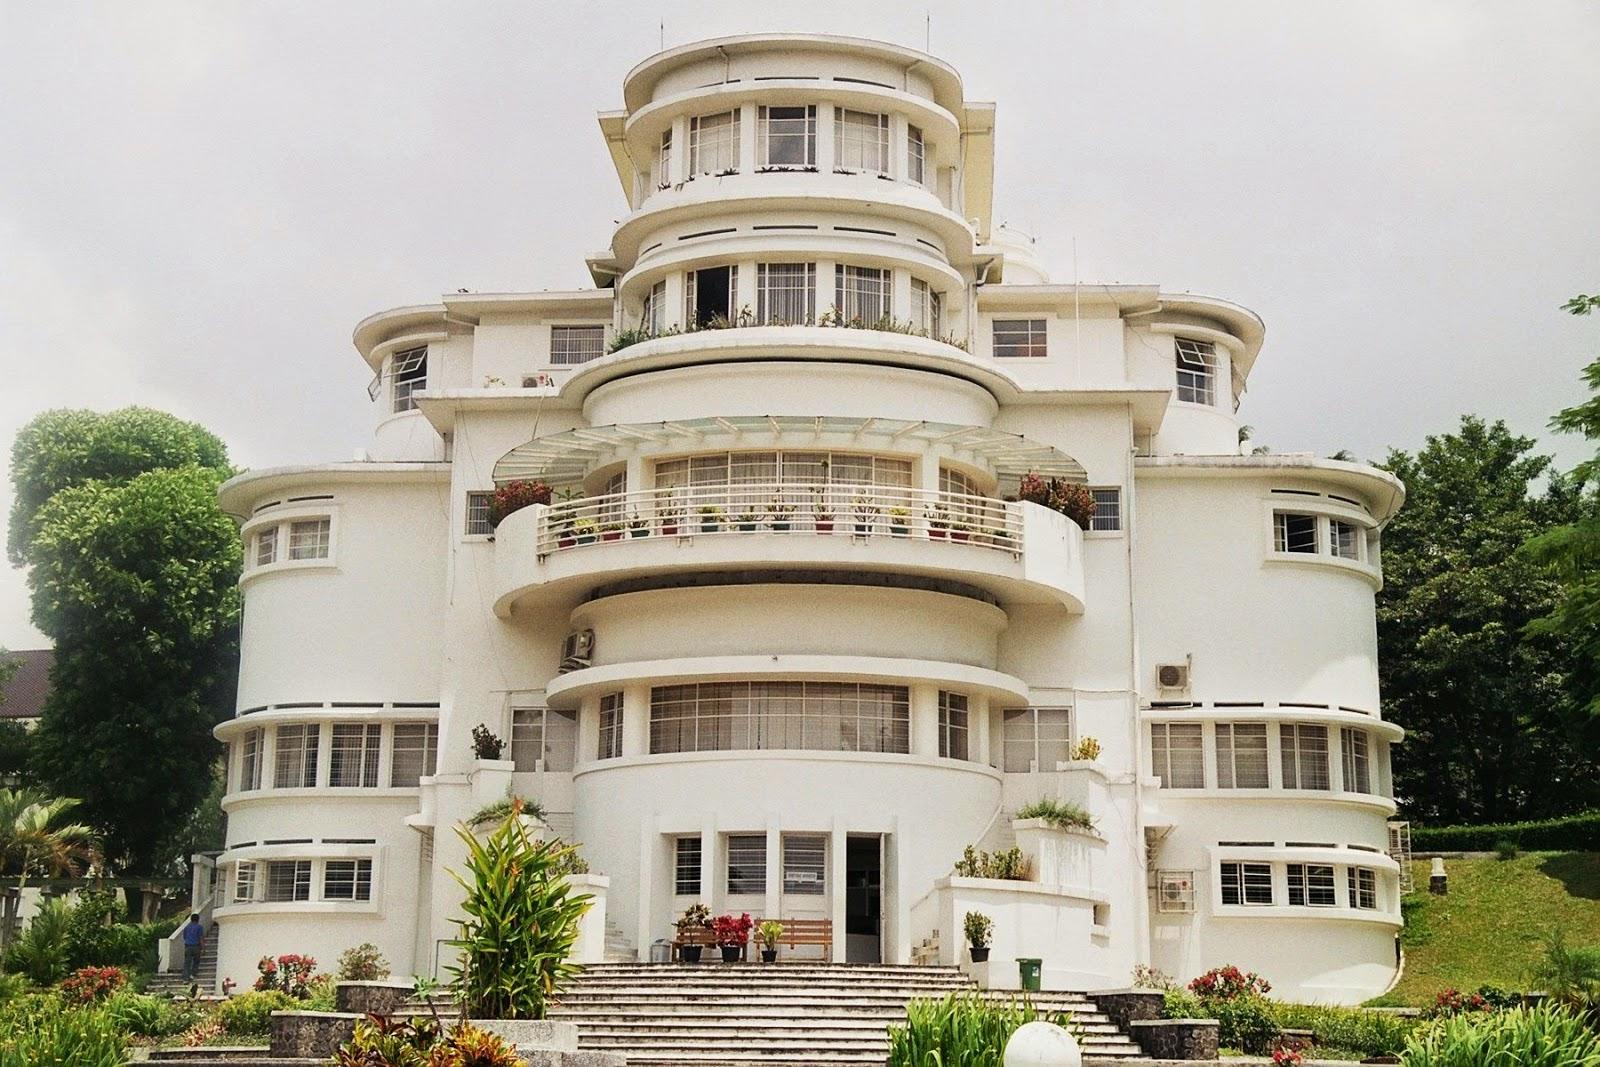 Villa Isola Art Deco